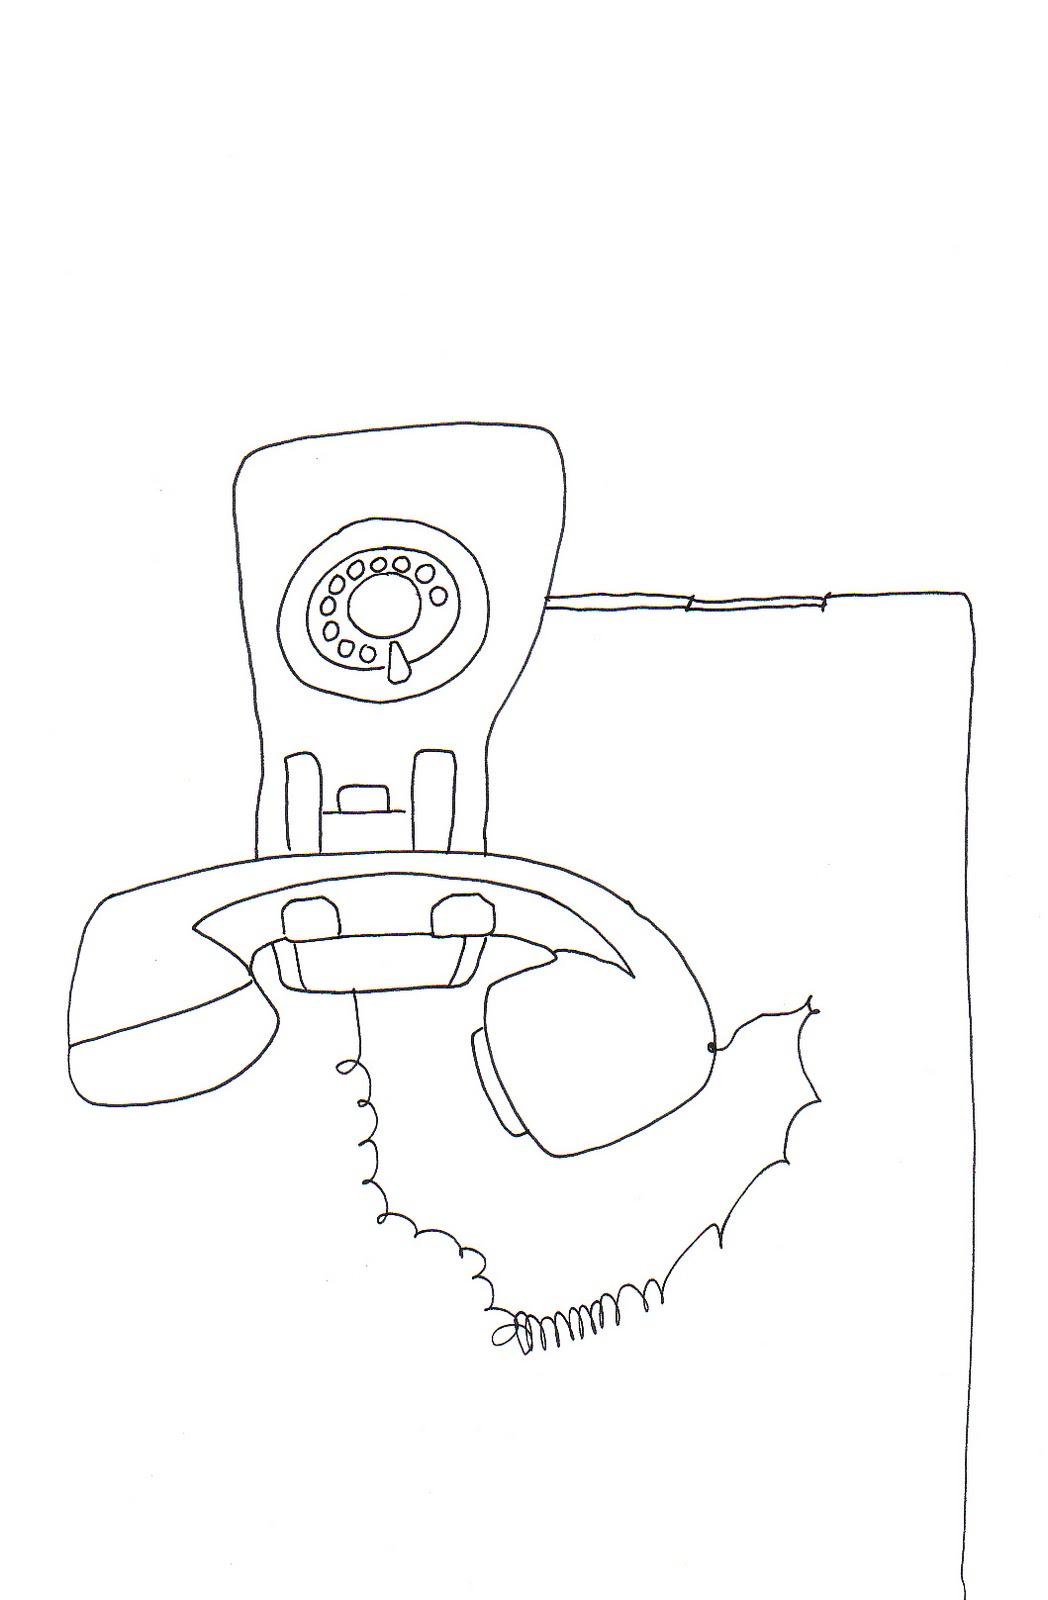 Gabriela-Sanchez-Drawing12.jpg